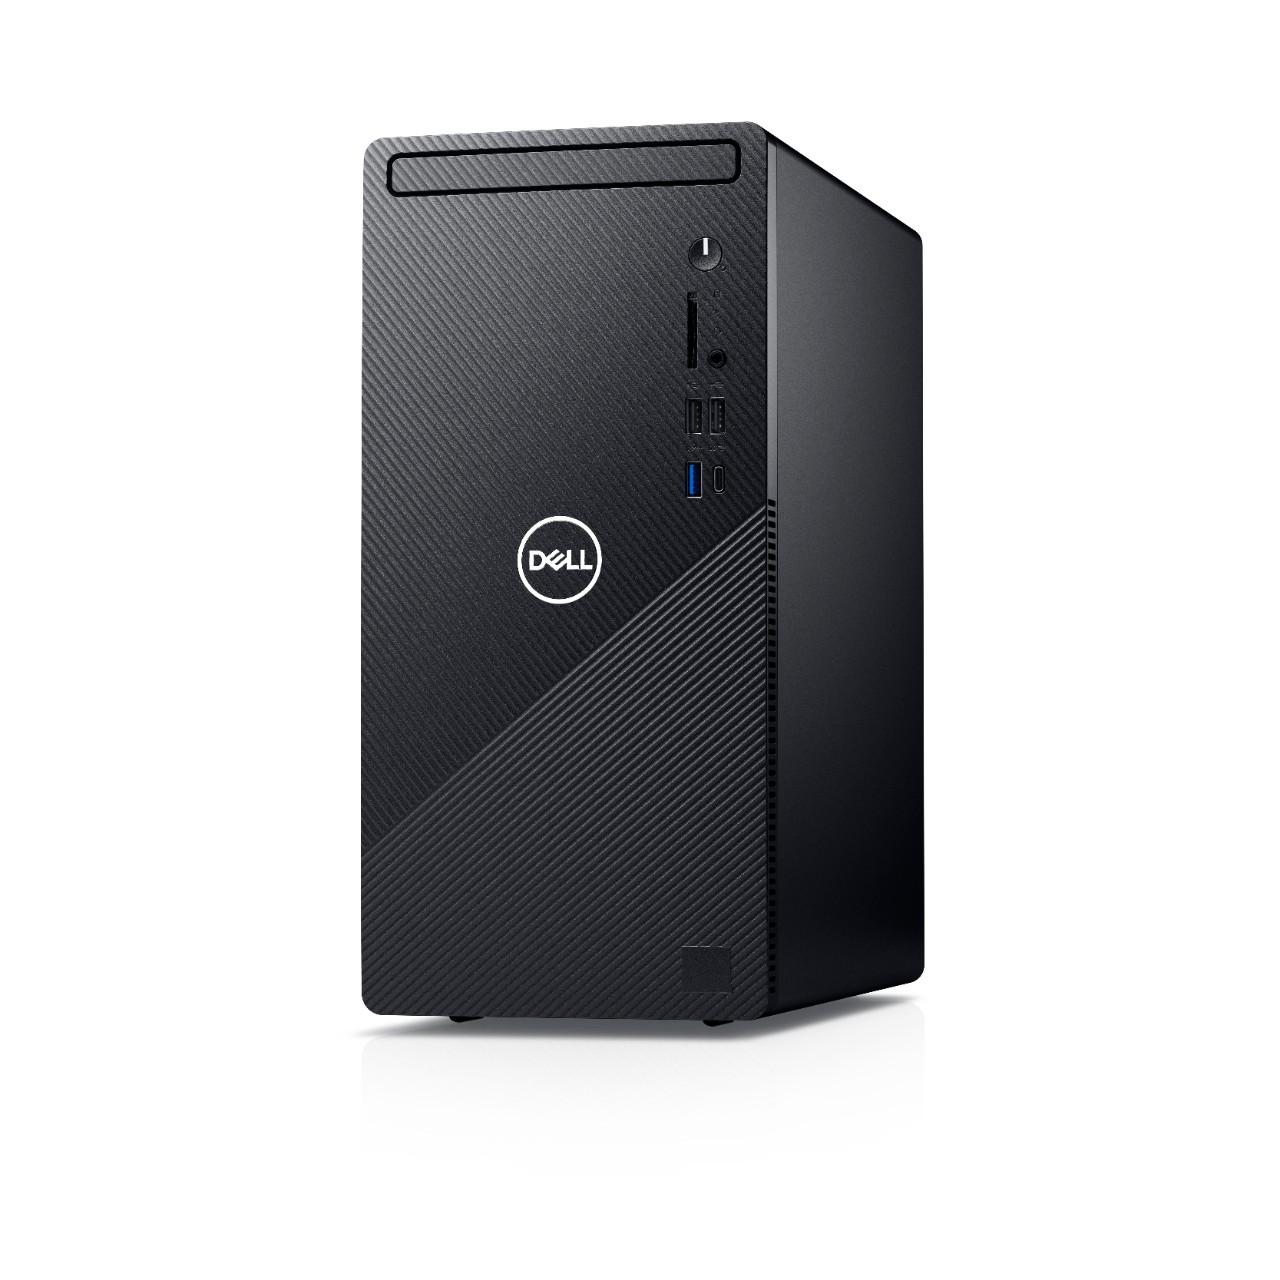 Dell Inspiron DT 3891 i3-10105/8GB/1TB/DVD/W10Pro/3RNBD/Černý - 3891-37999